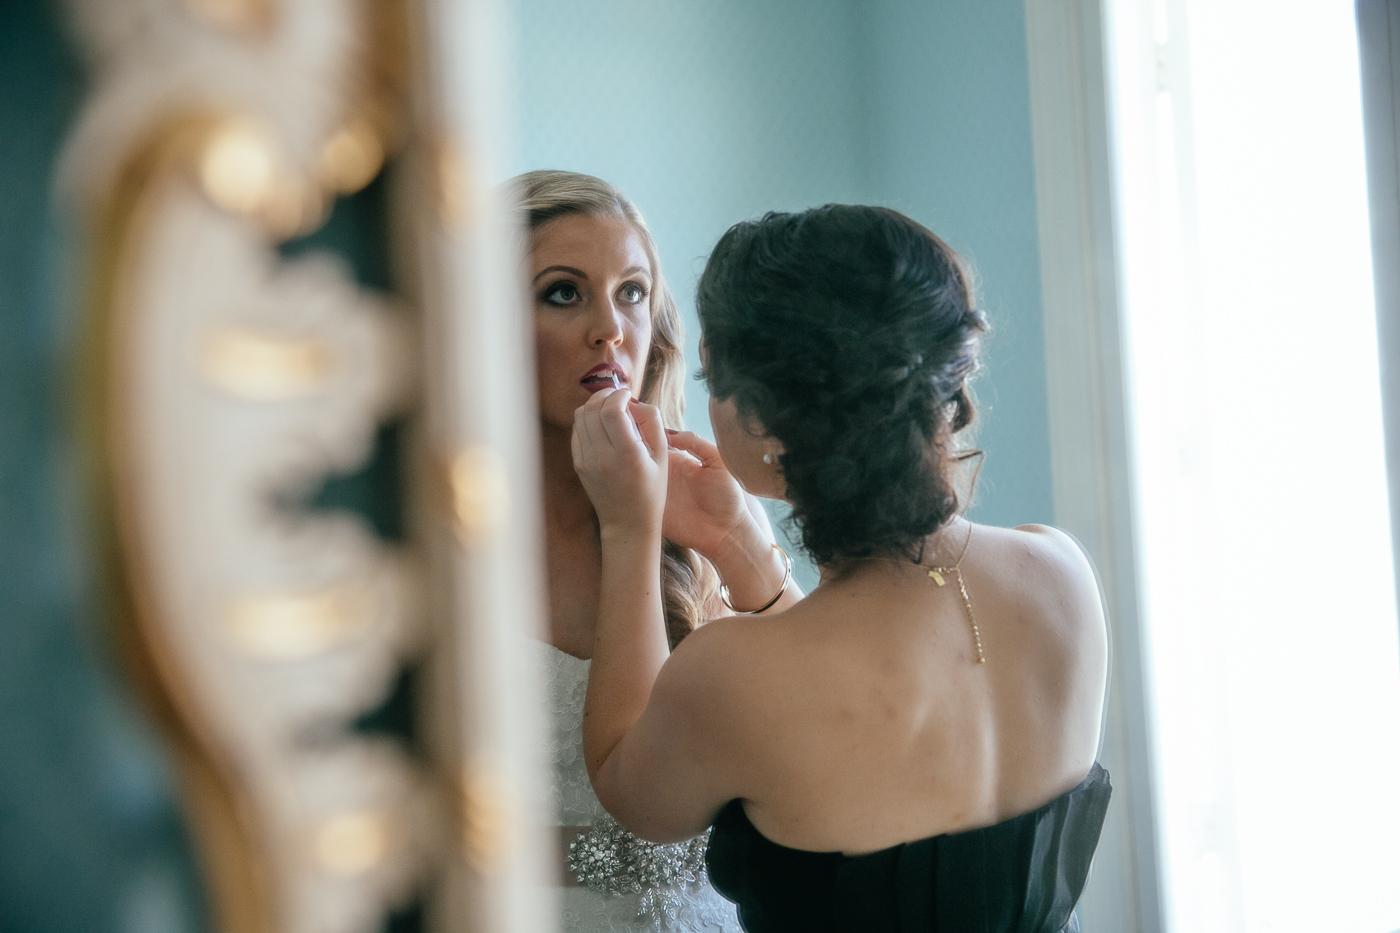 RYAN_&_KELLEY_DARLINGTON_HOUSE_WEDDING_2014_7X9A1949.JPG